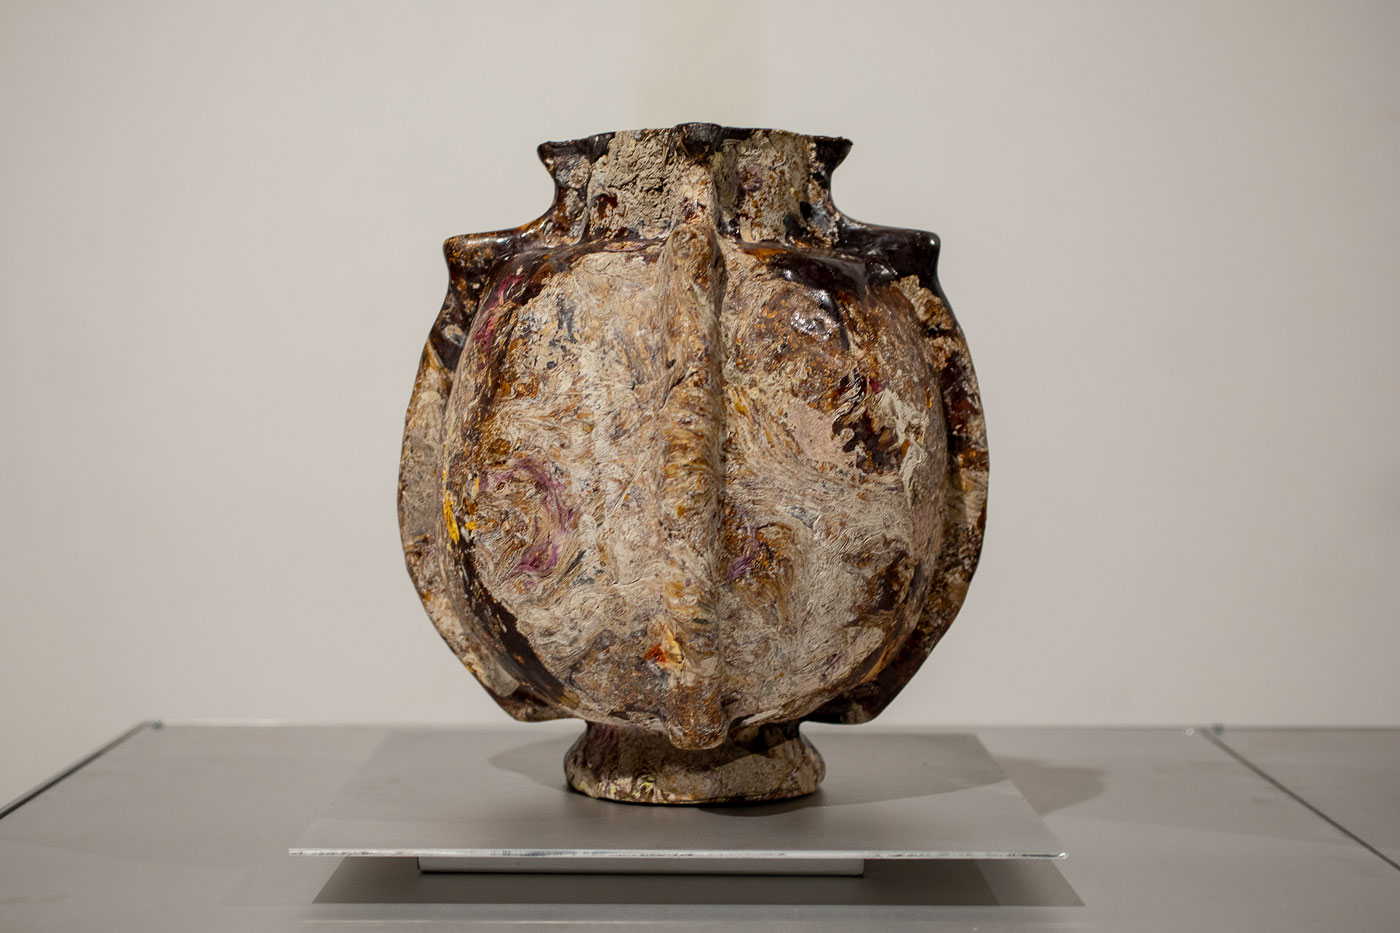 Marcin Rusak, Perishable Vases